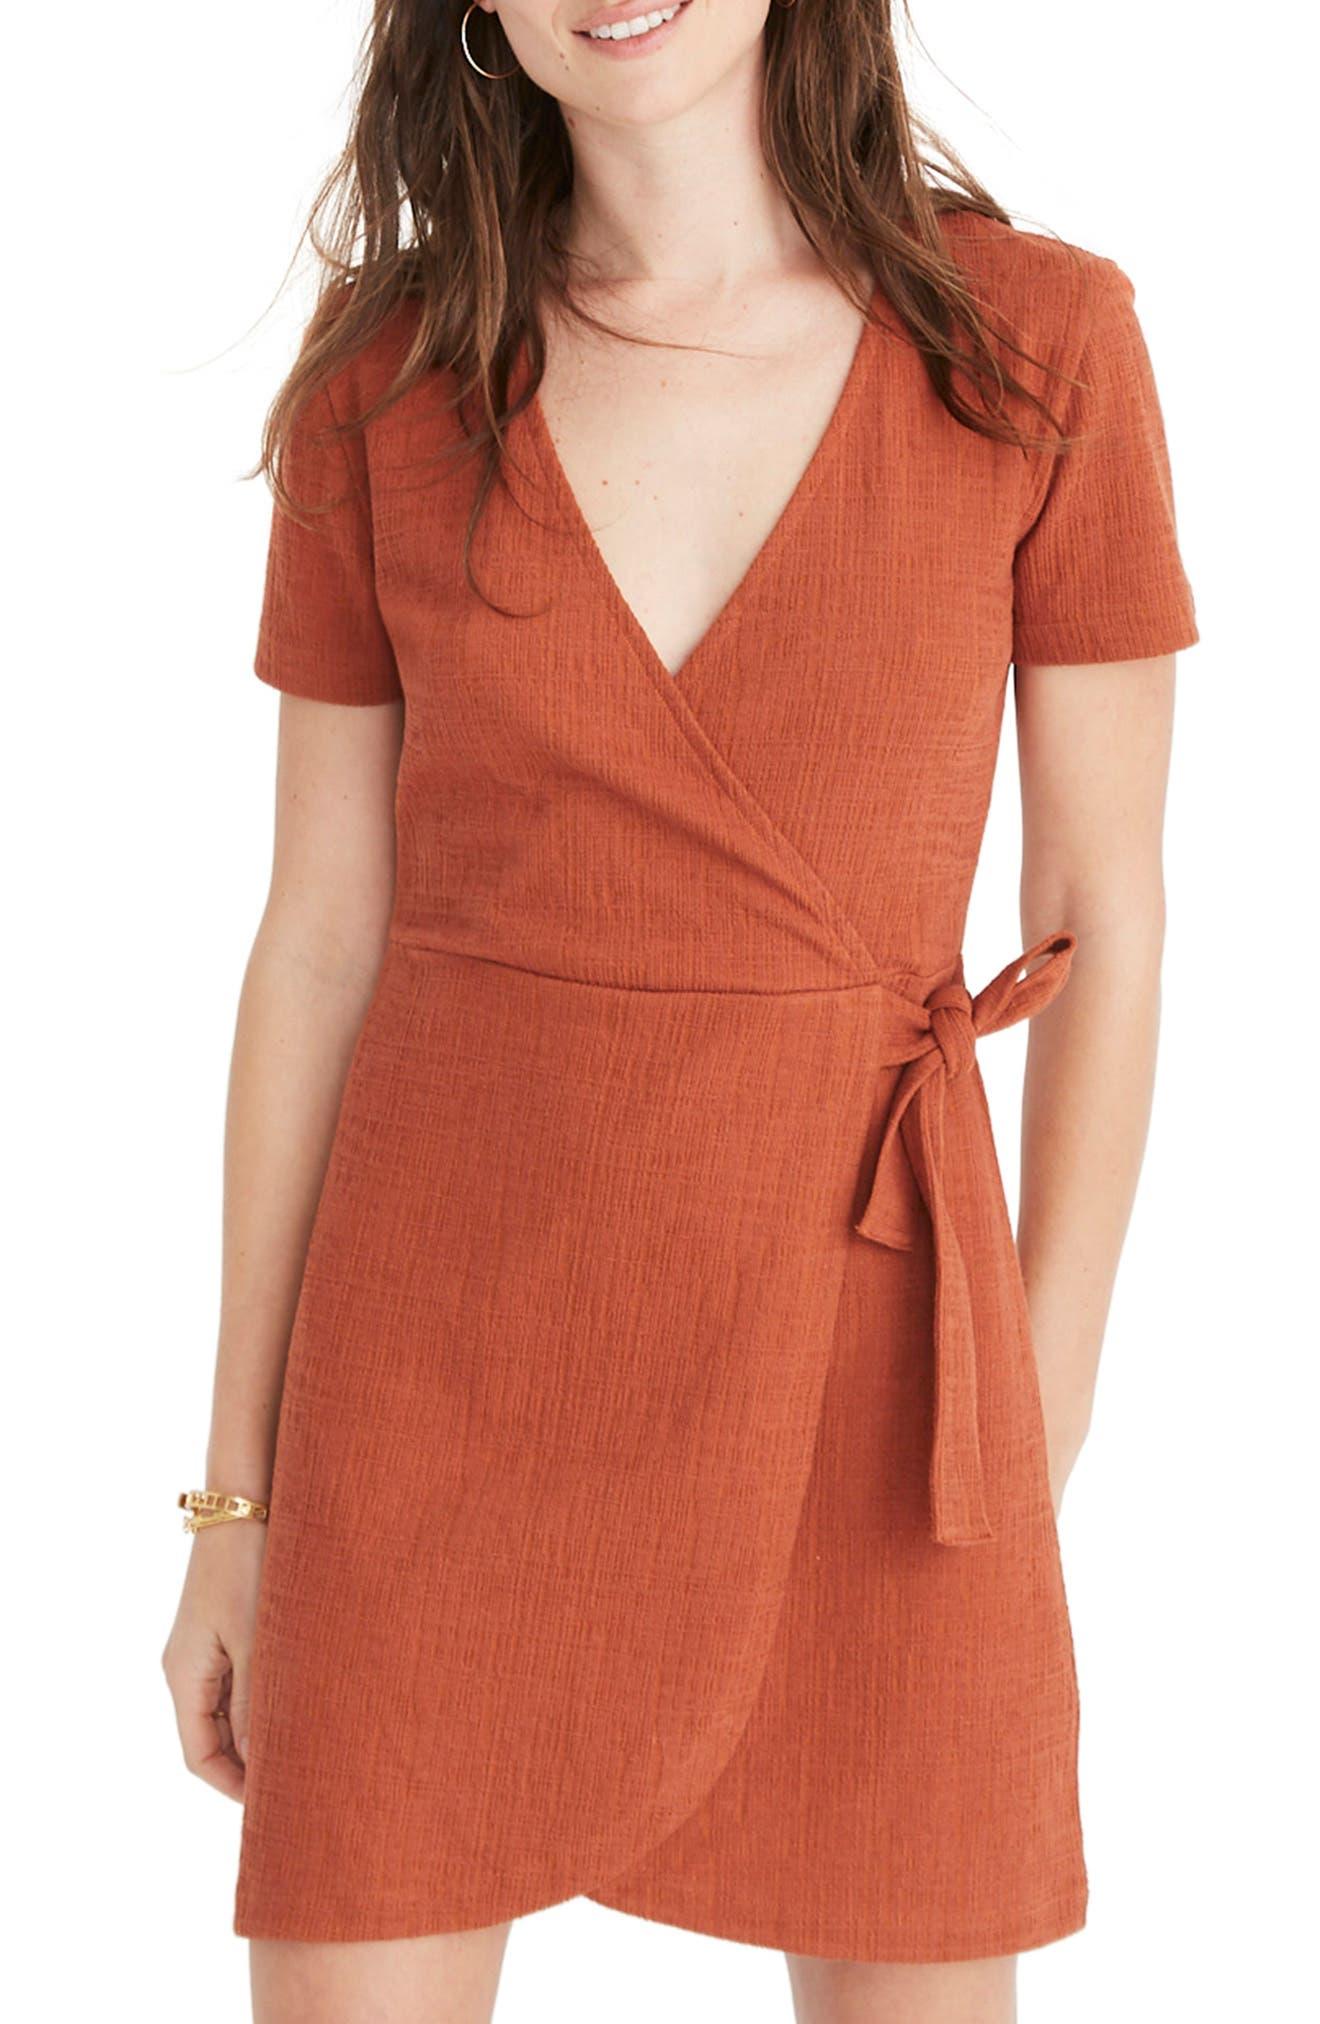 Madewell Texture & Thread Short Sleeve Side Tie Dress